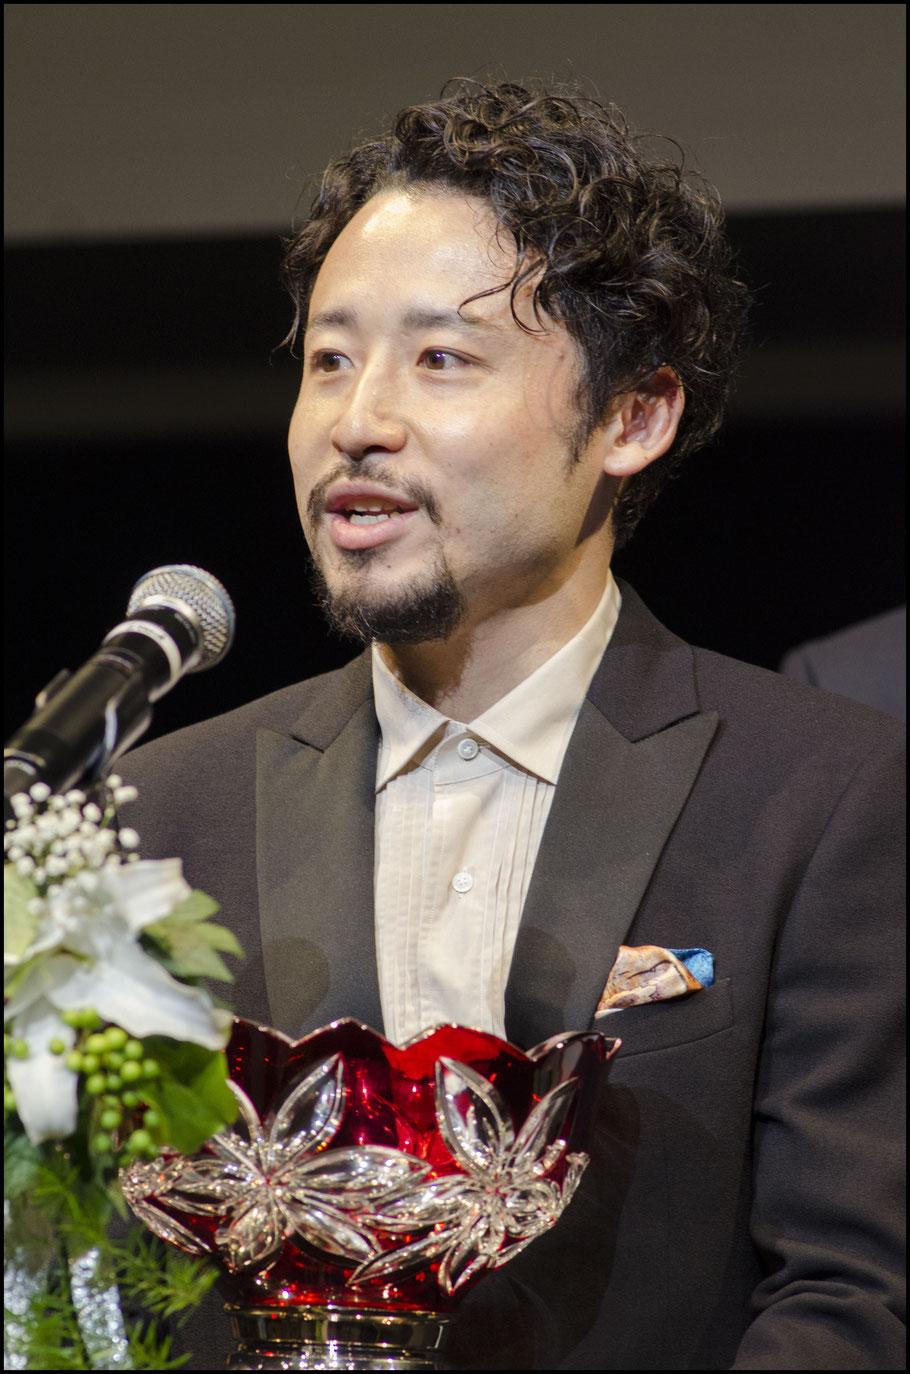 Yuta Tabuse accepted an award given to champions Tochigi Brex  - Chris Pfaff, Inside Sport: Japan, May 30, 2017